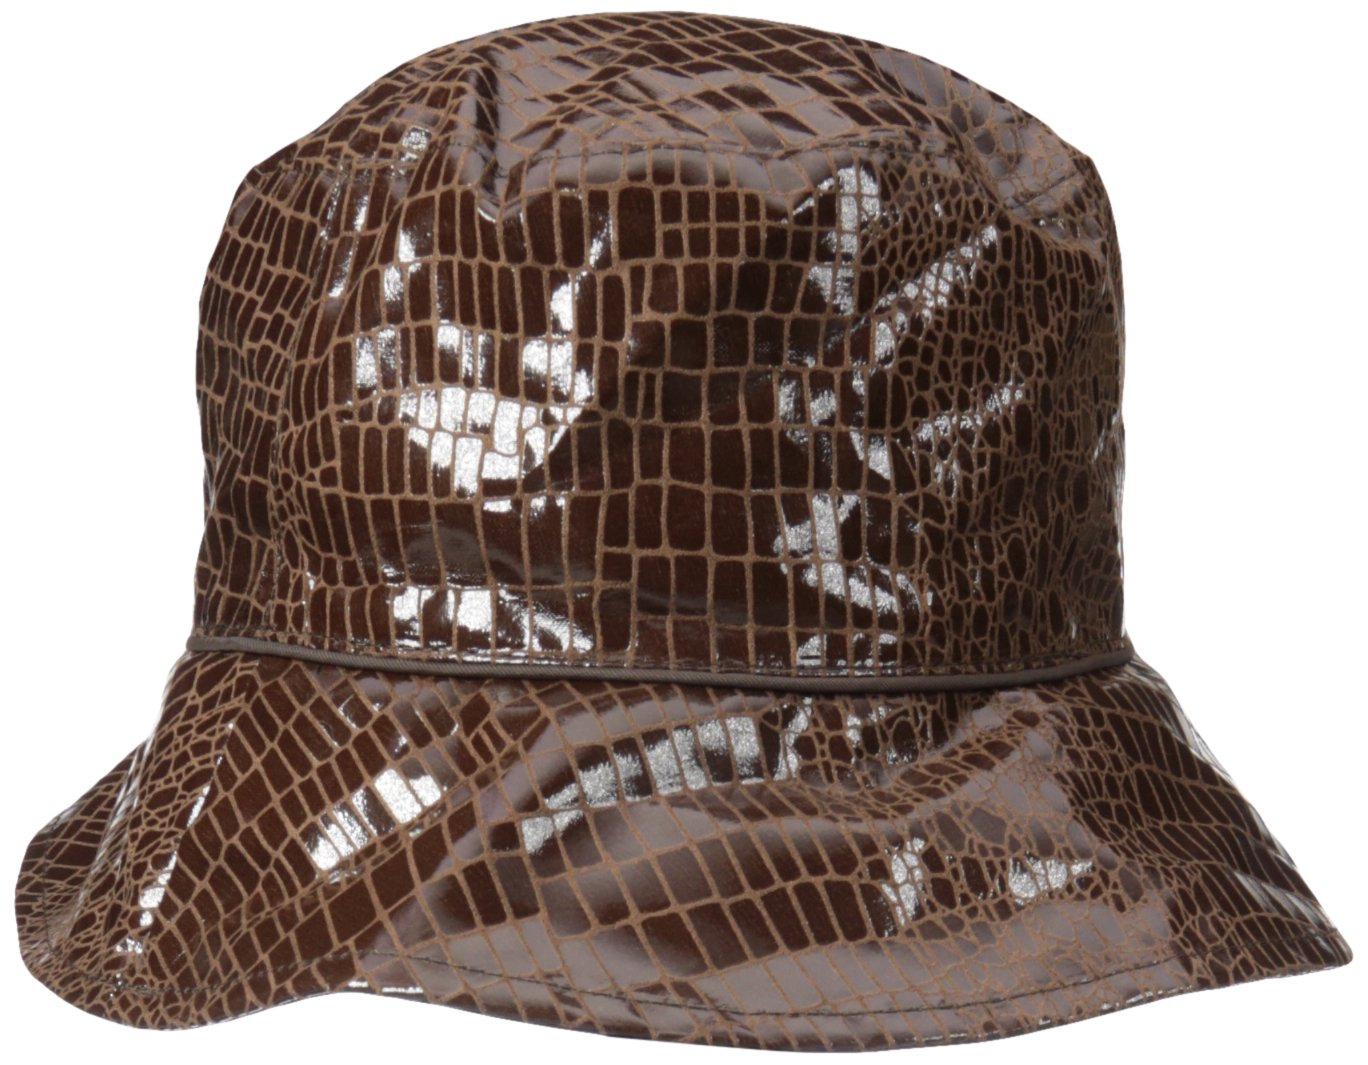 Nine West Women's Reversible Bucket Rain Hat, Brown, One Size